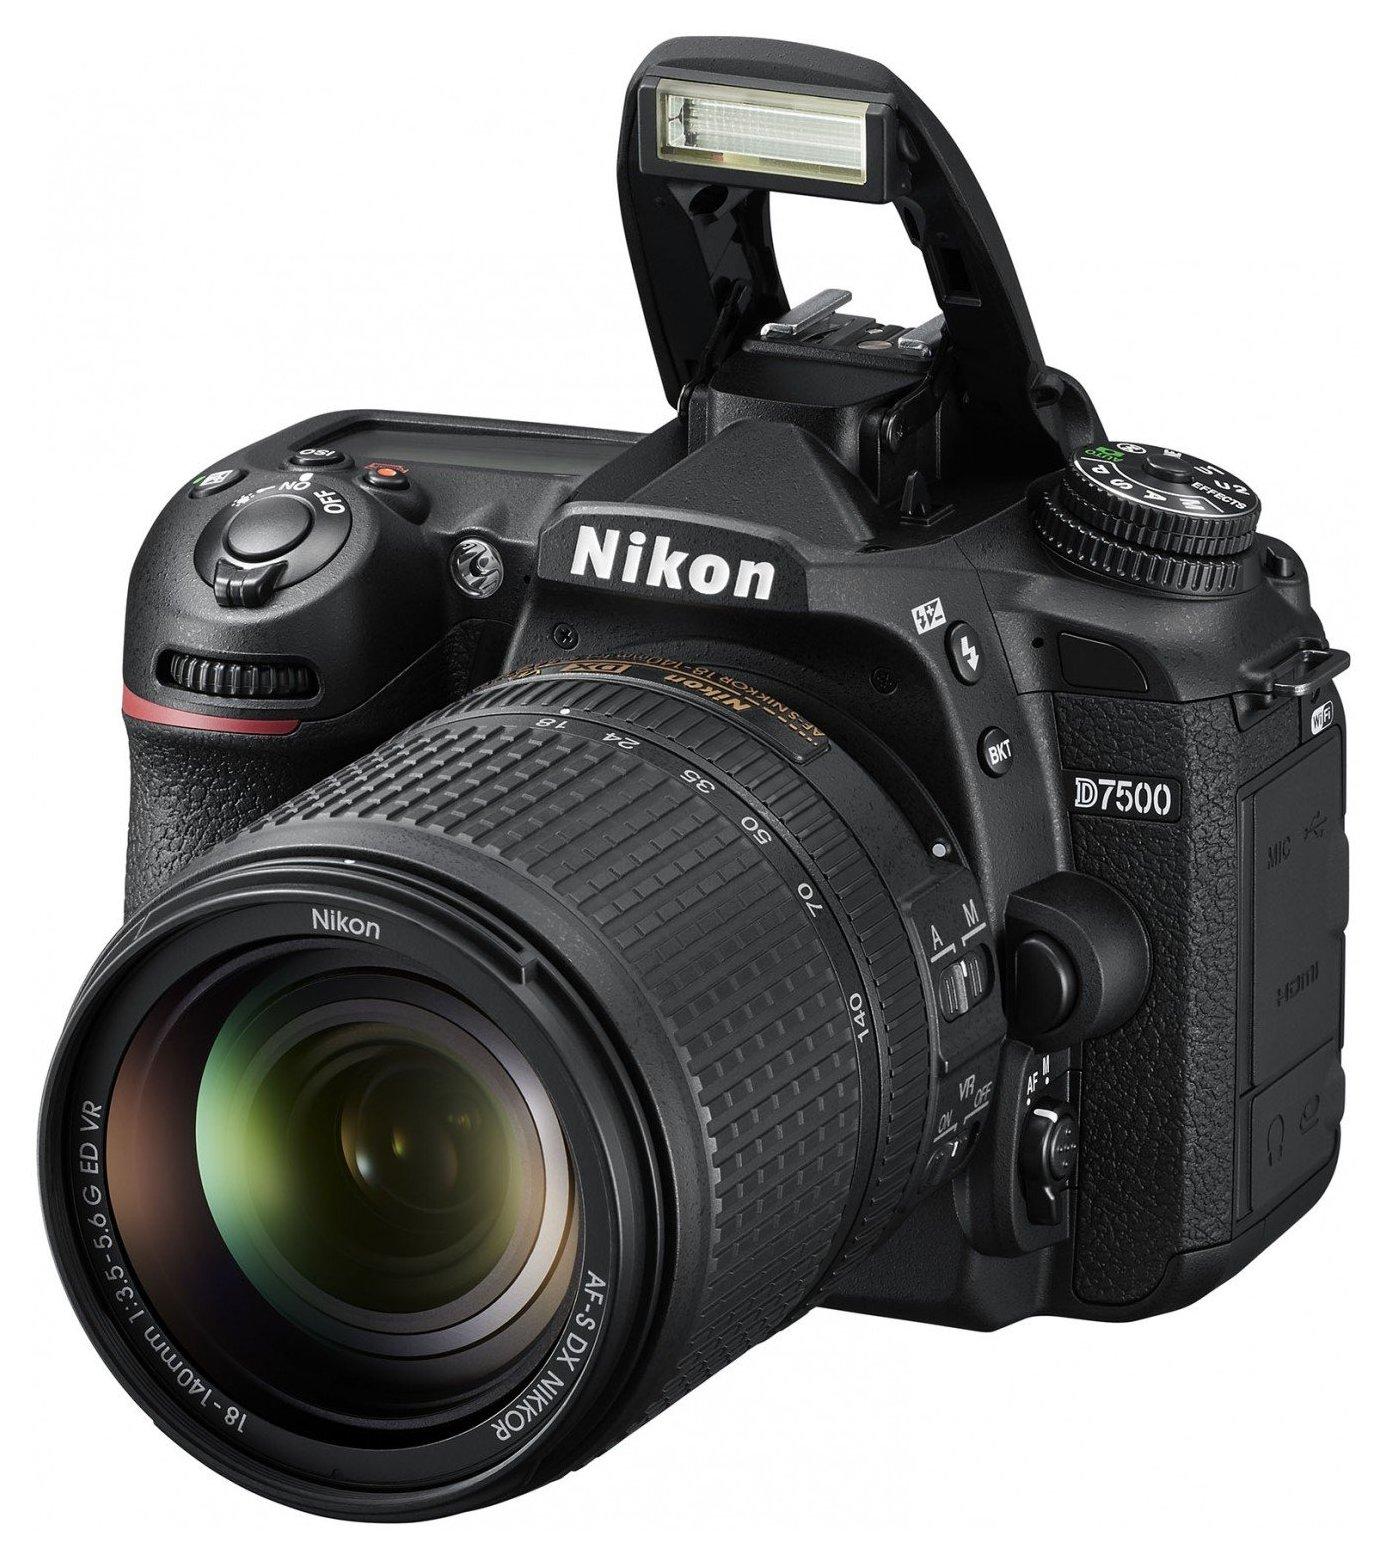 Зеркальный фотоаппарат Nikon D7500 Kit Black фото